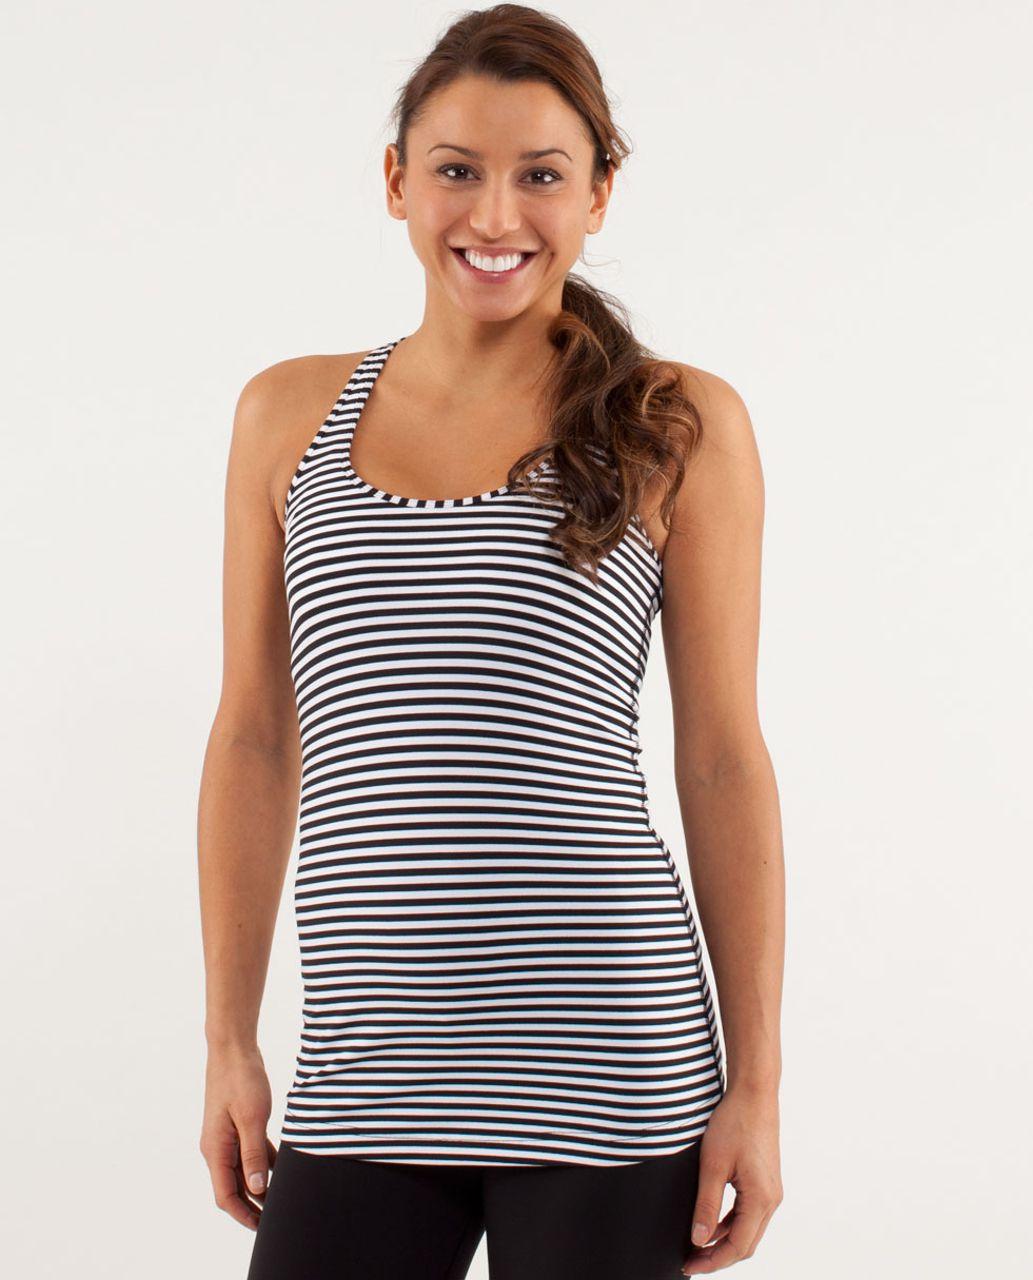 Lululemon Cool Racerback - Classic Stripe Black White / Black